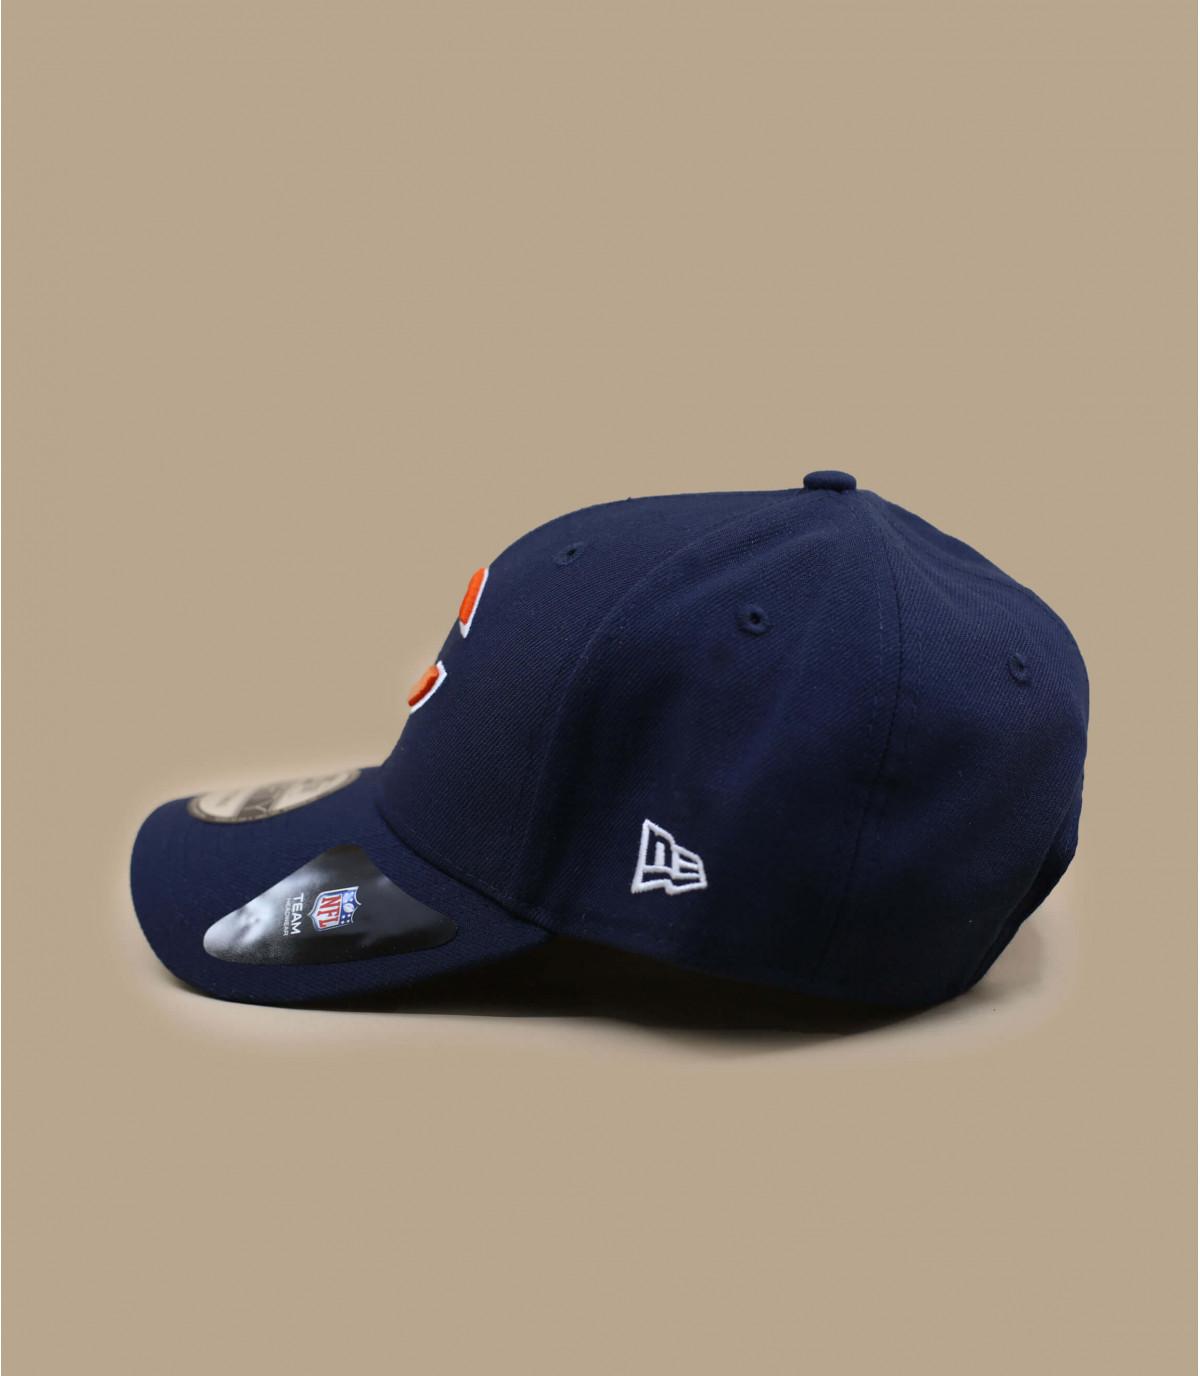 navy-blue Bears curve cap